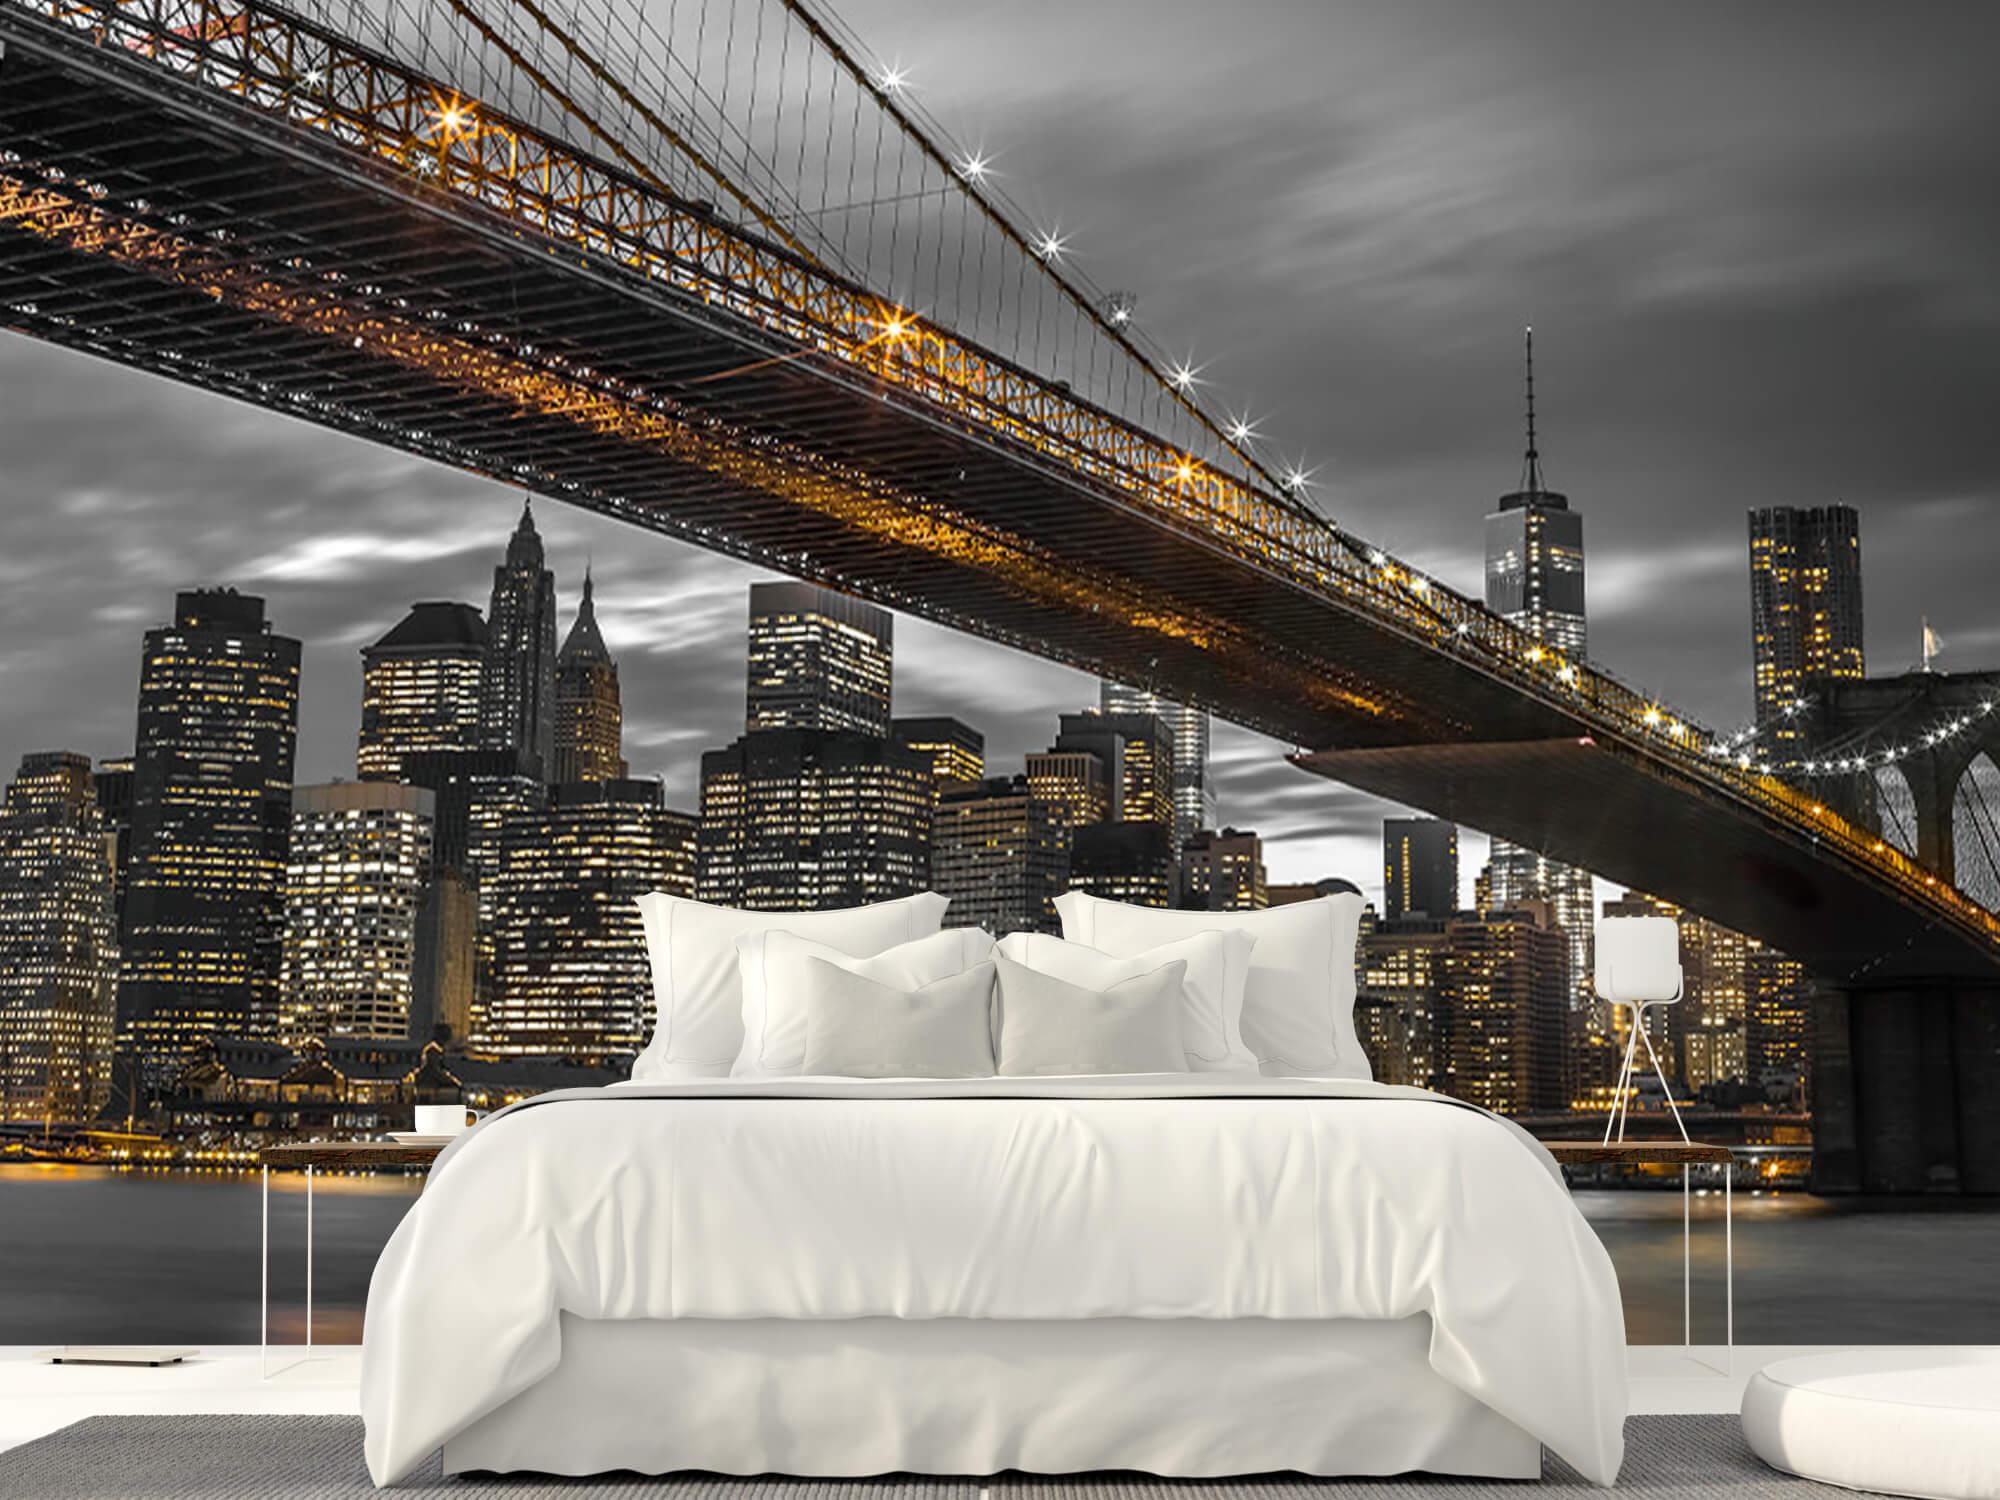 Brooklyn Bridge, New York 19